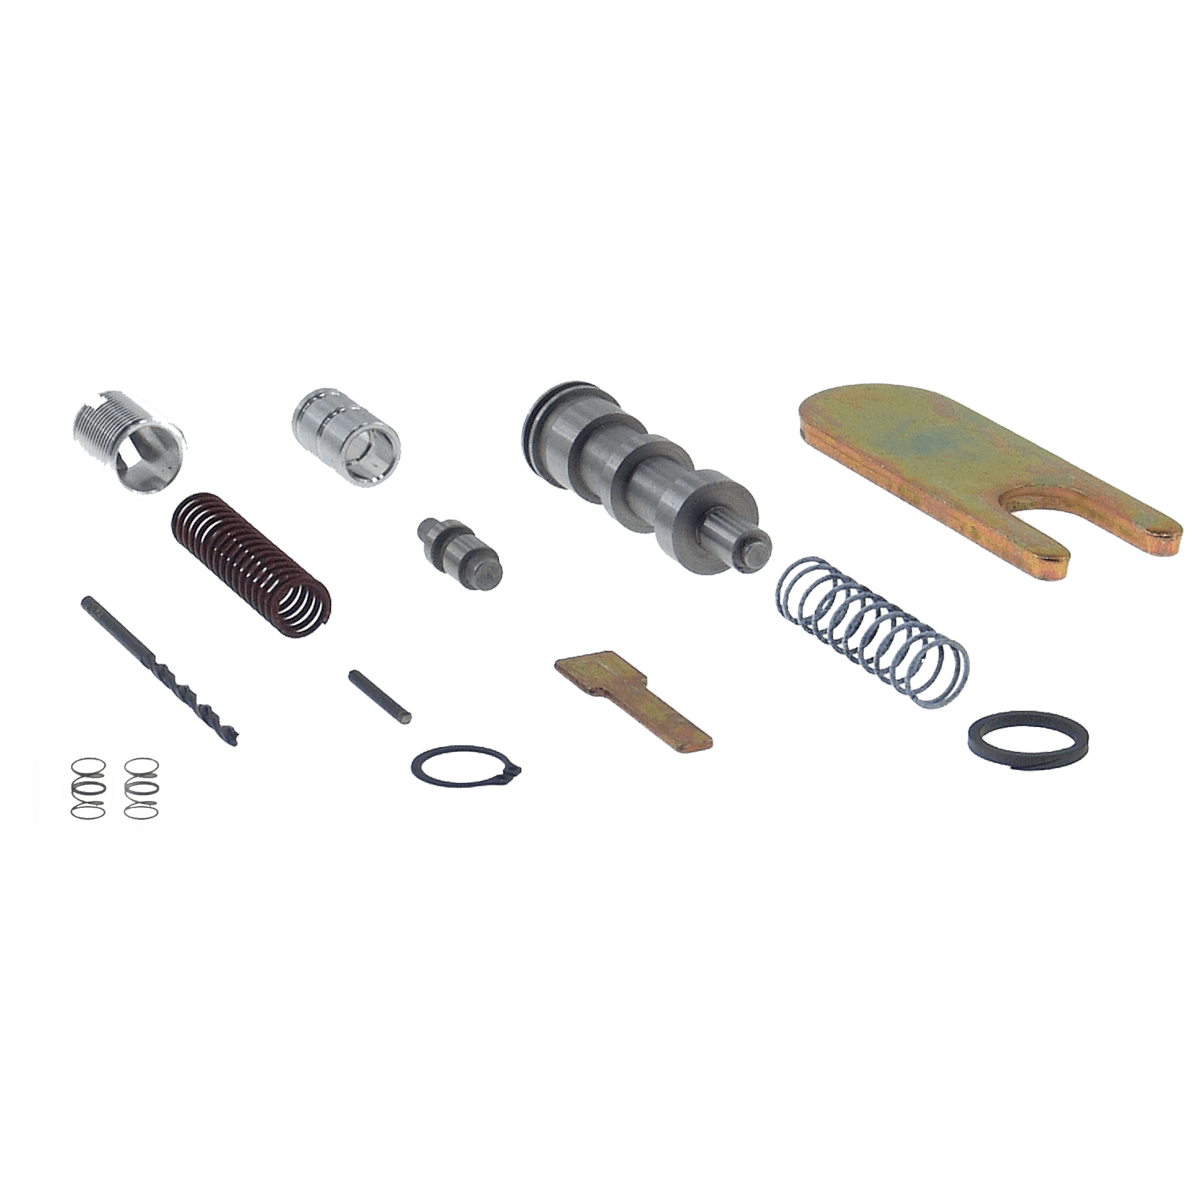 VW JETTA GTITransGo O1M O1P Updated Valve BodySolenoid Shift Kit SK VW-01M